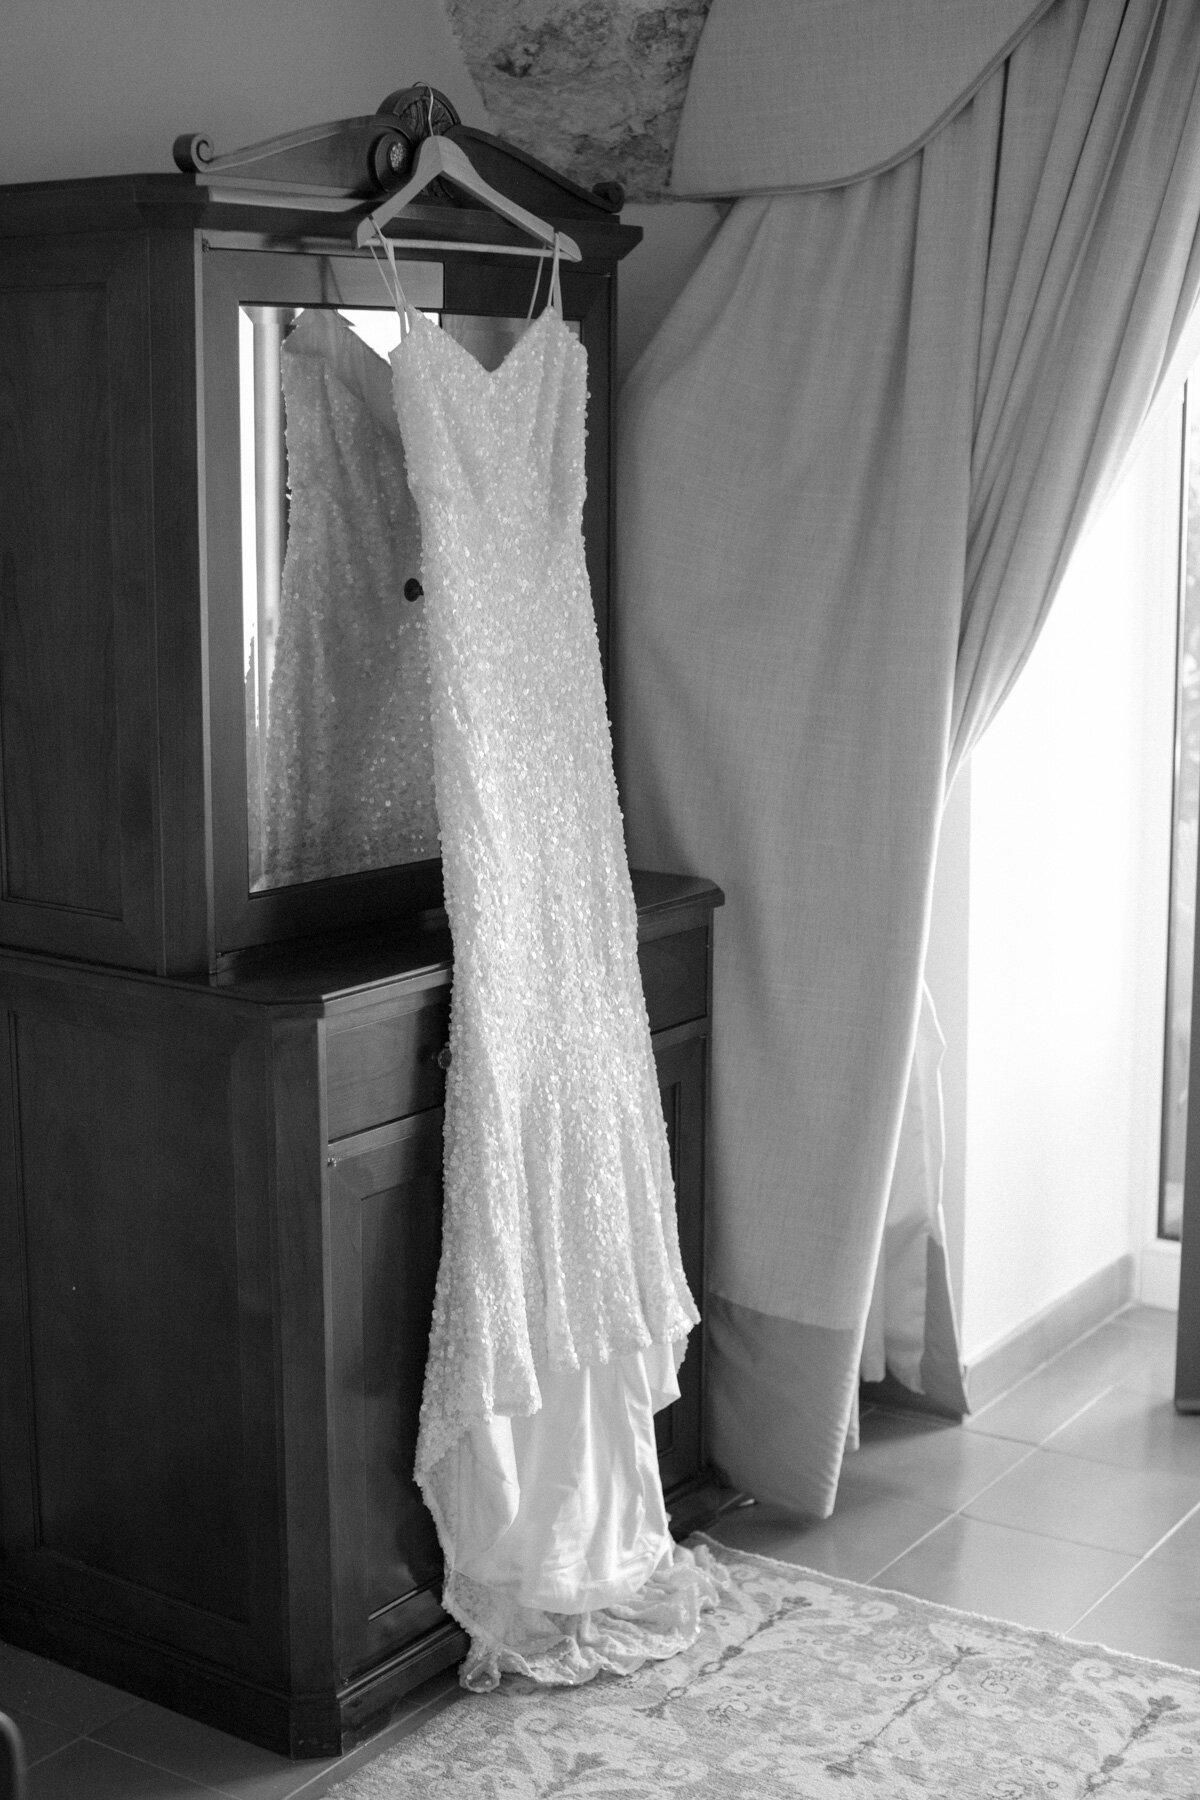 Belmond-Hotel-Caruso-ravello-elopement-Katie-Grant-destination-wedding (13 of 50).jpg